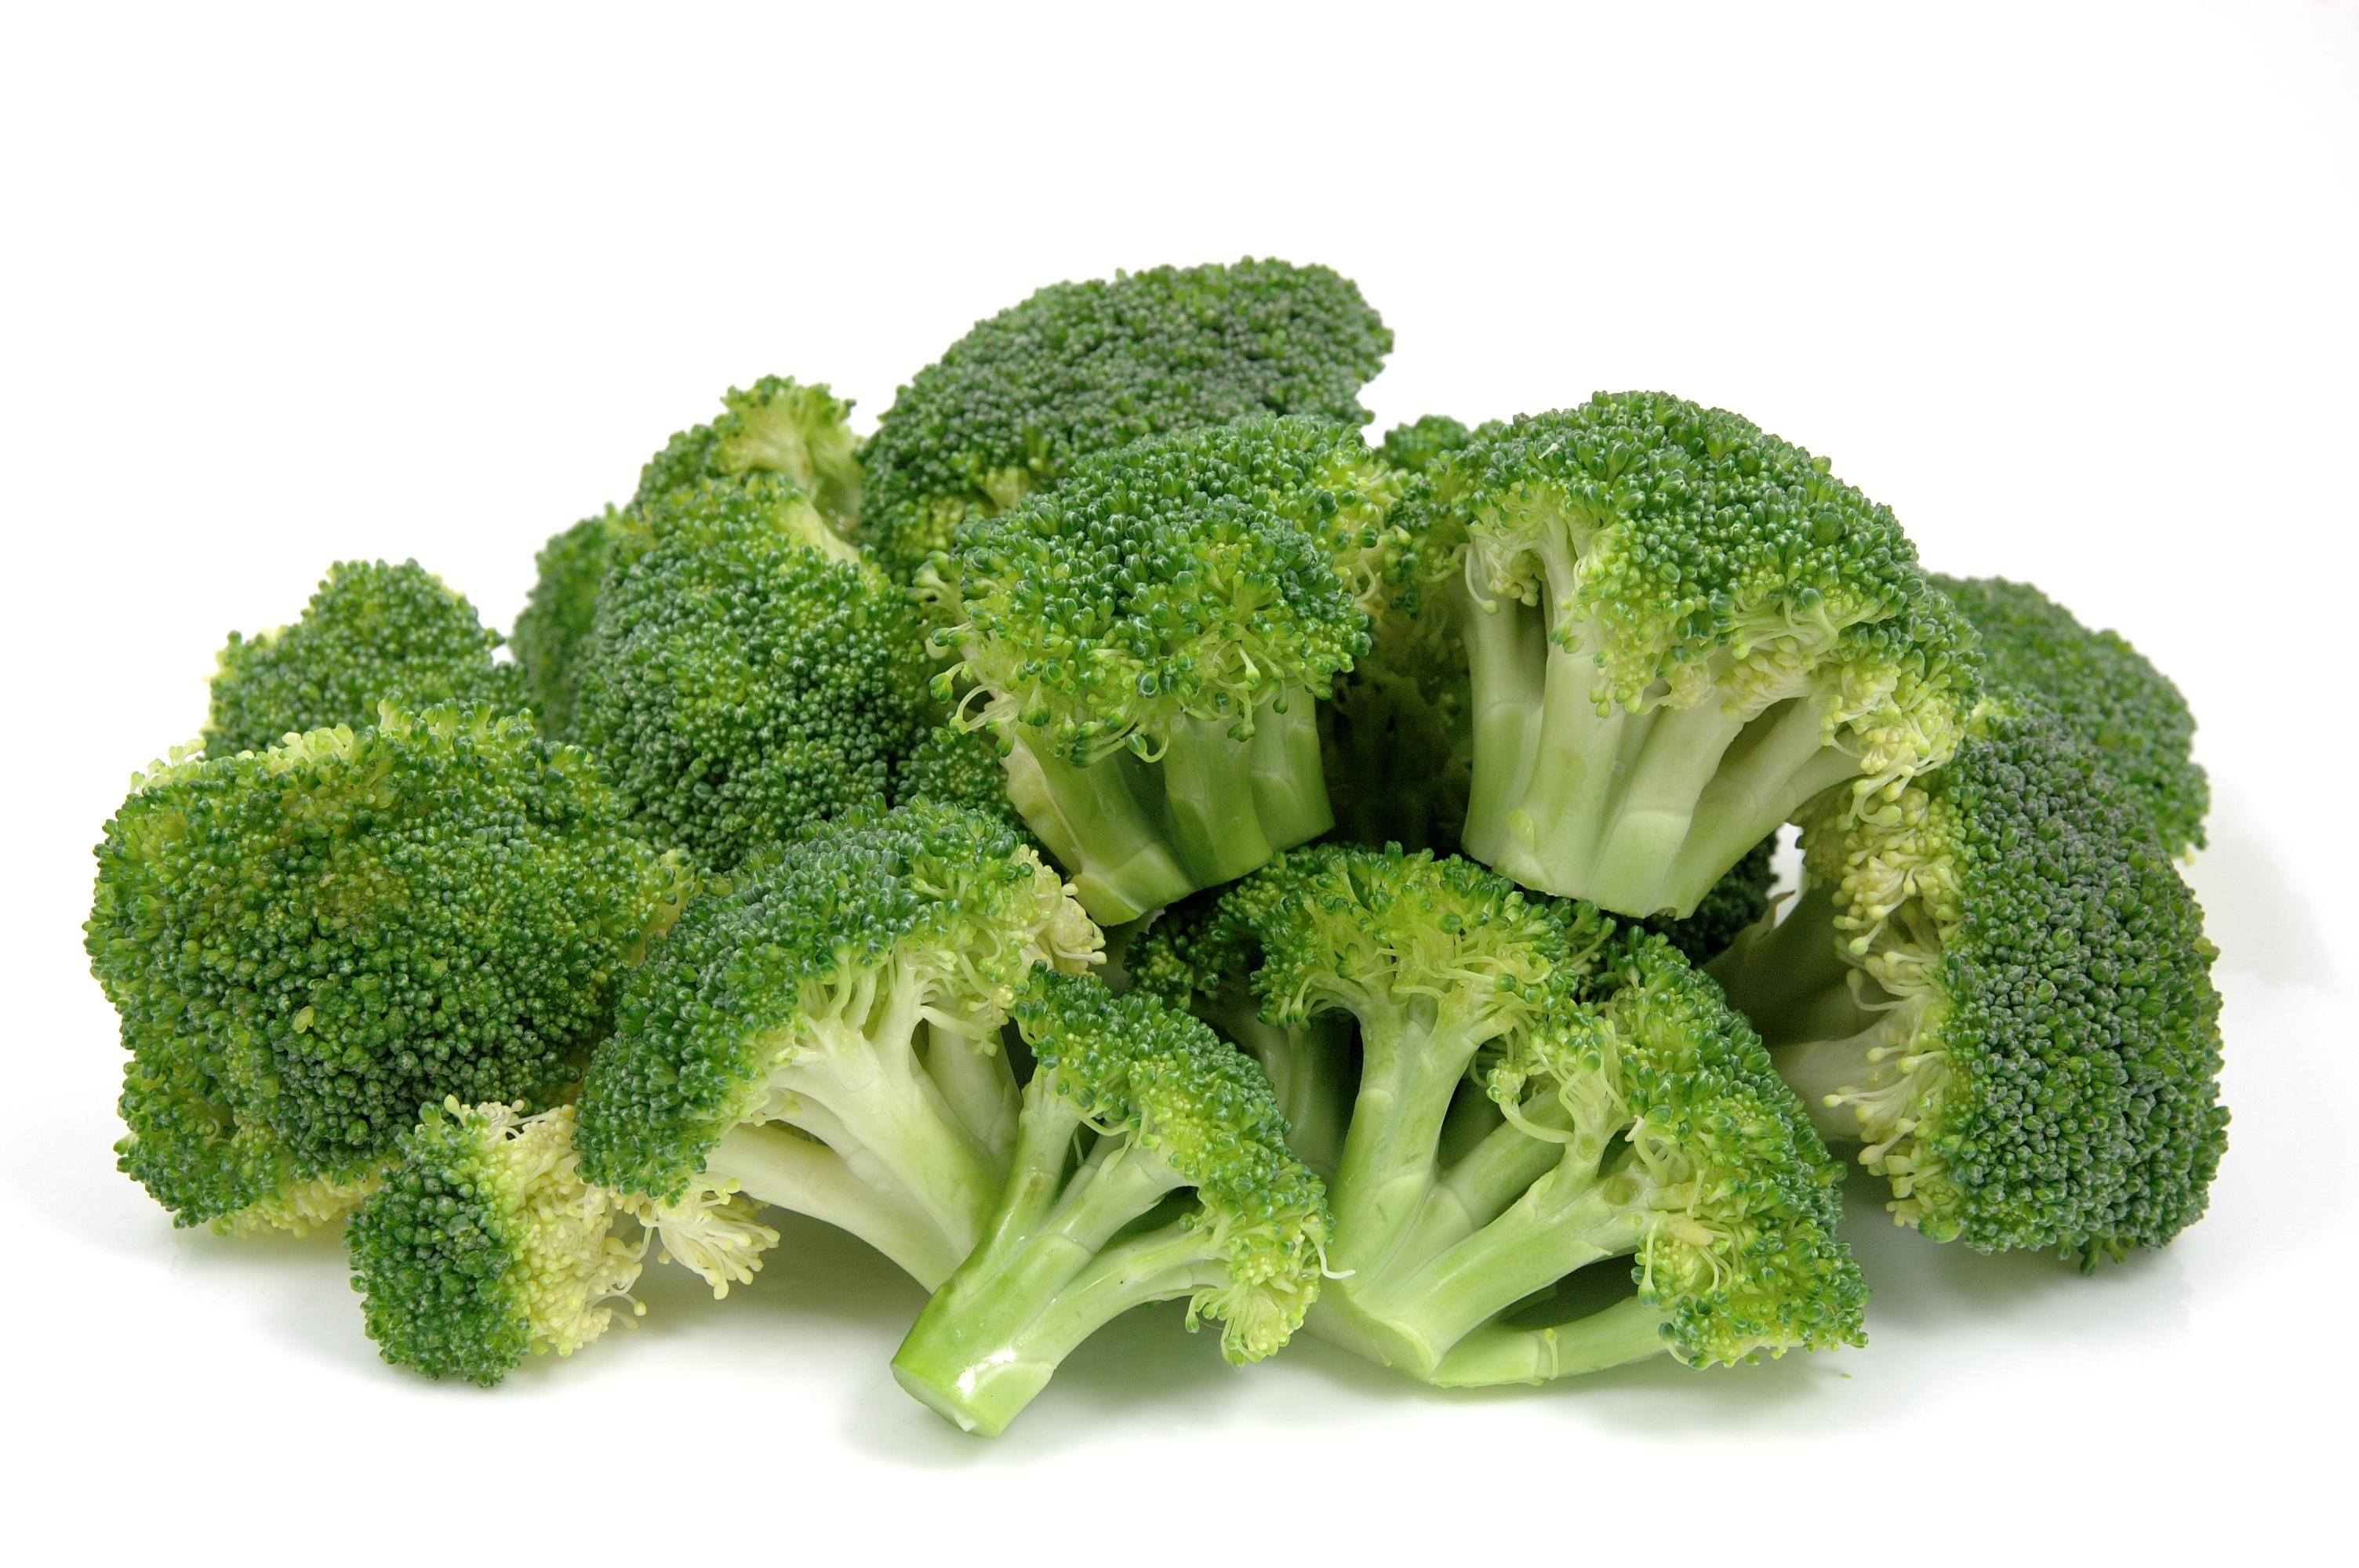 bigstock-Fresh-Broccoli-1665344-1.jpg